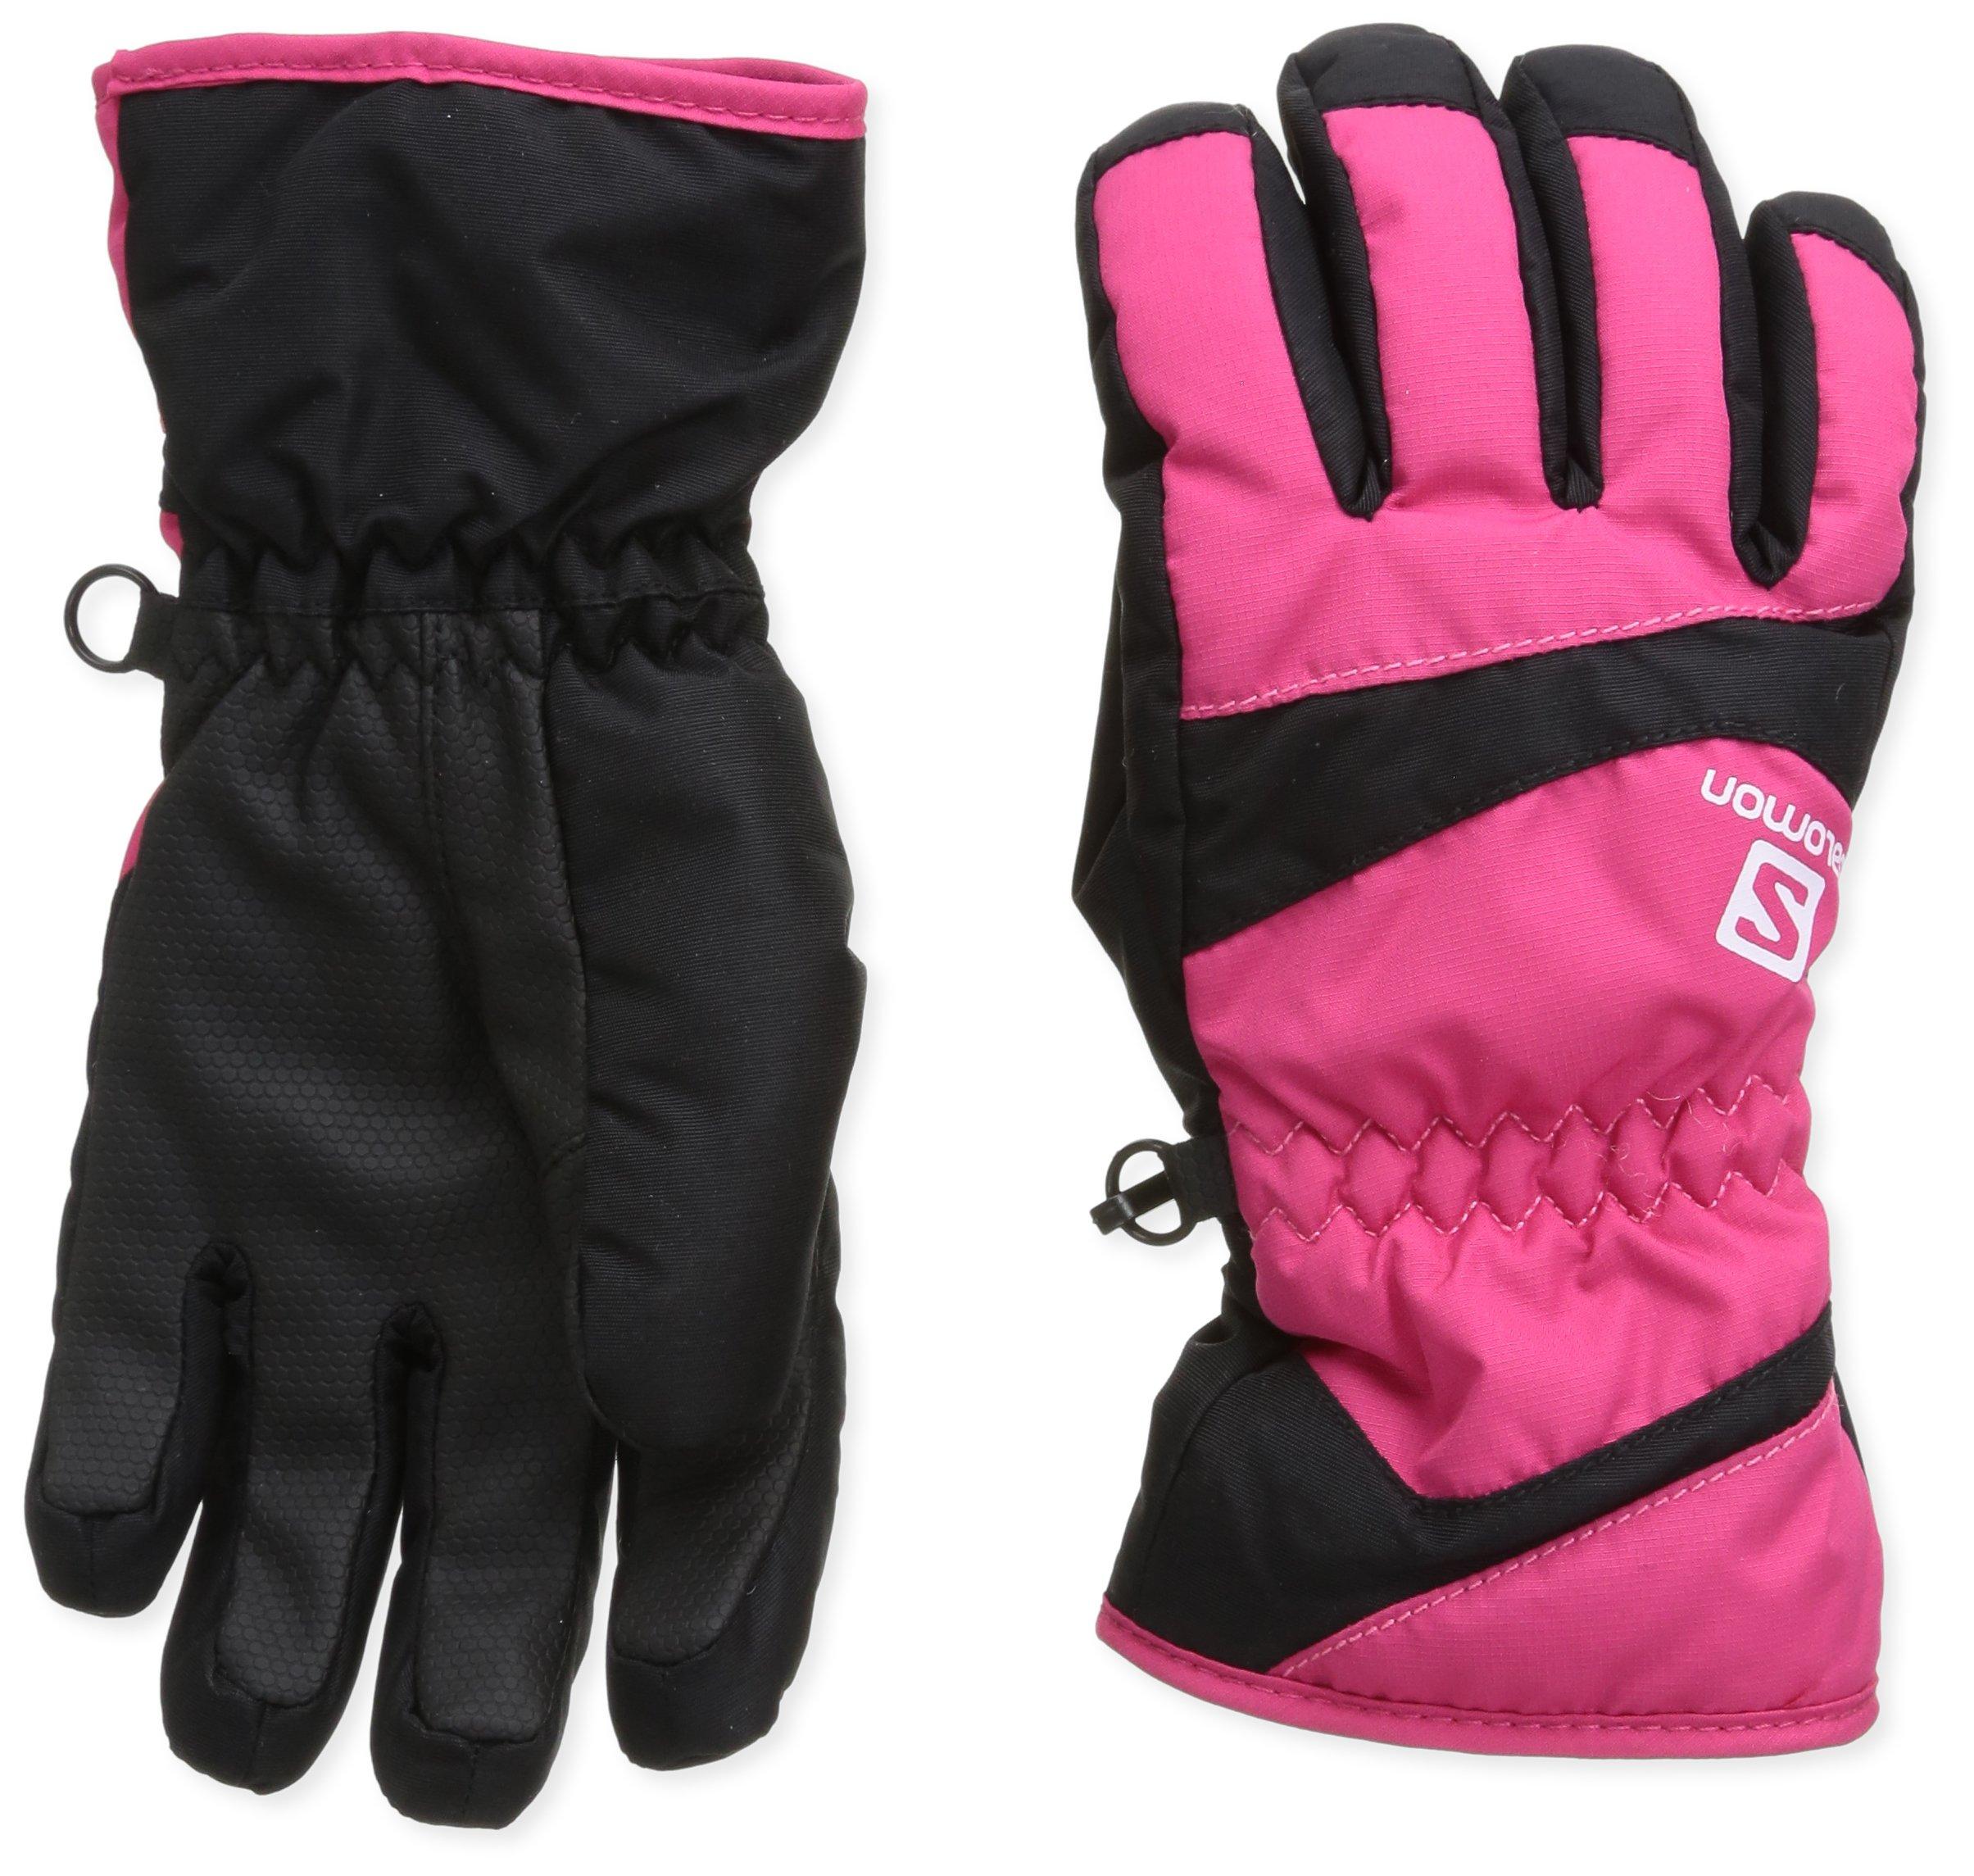 Salomon Juniors' Electre Glove Hot Pink / Black Large by Salomon